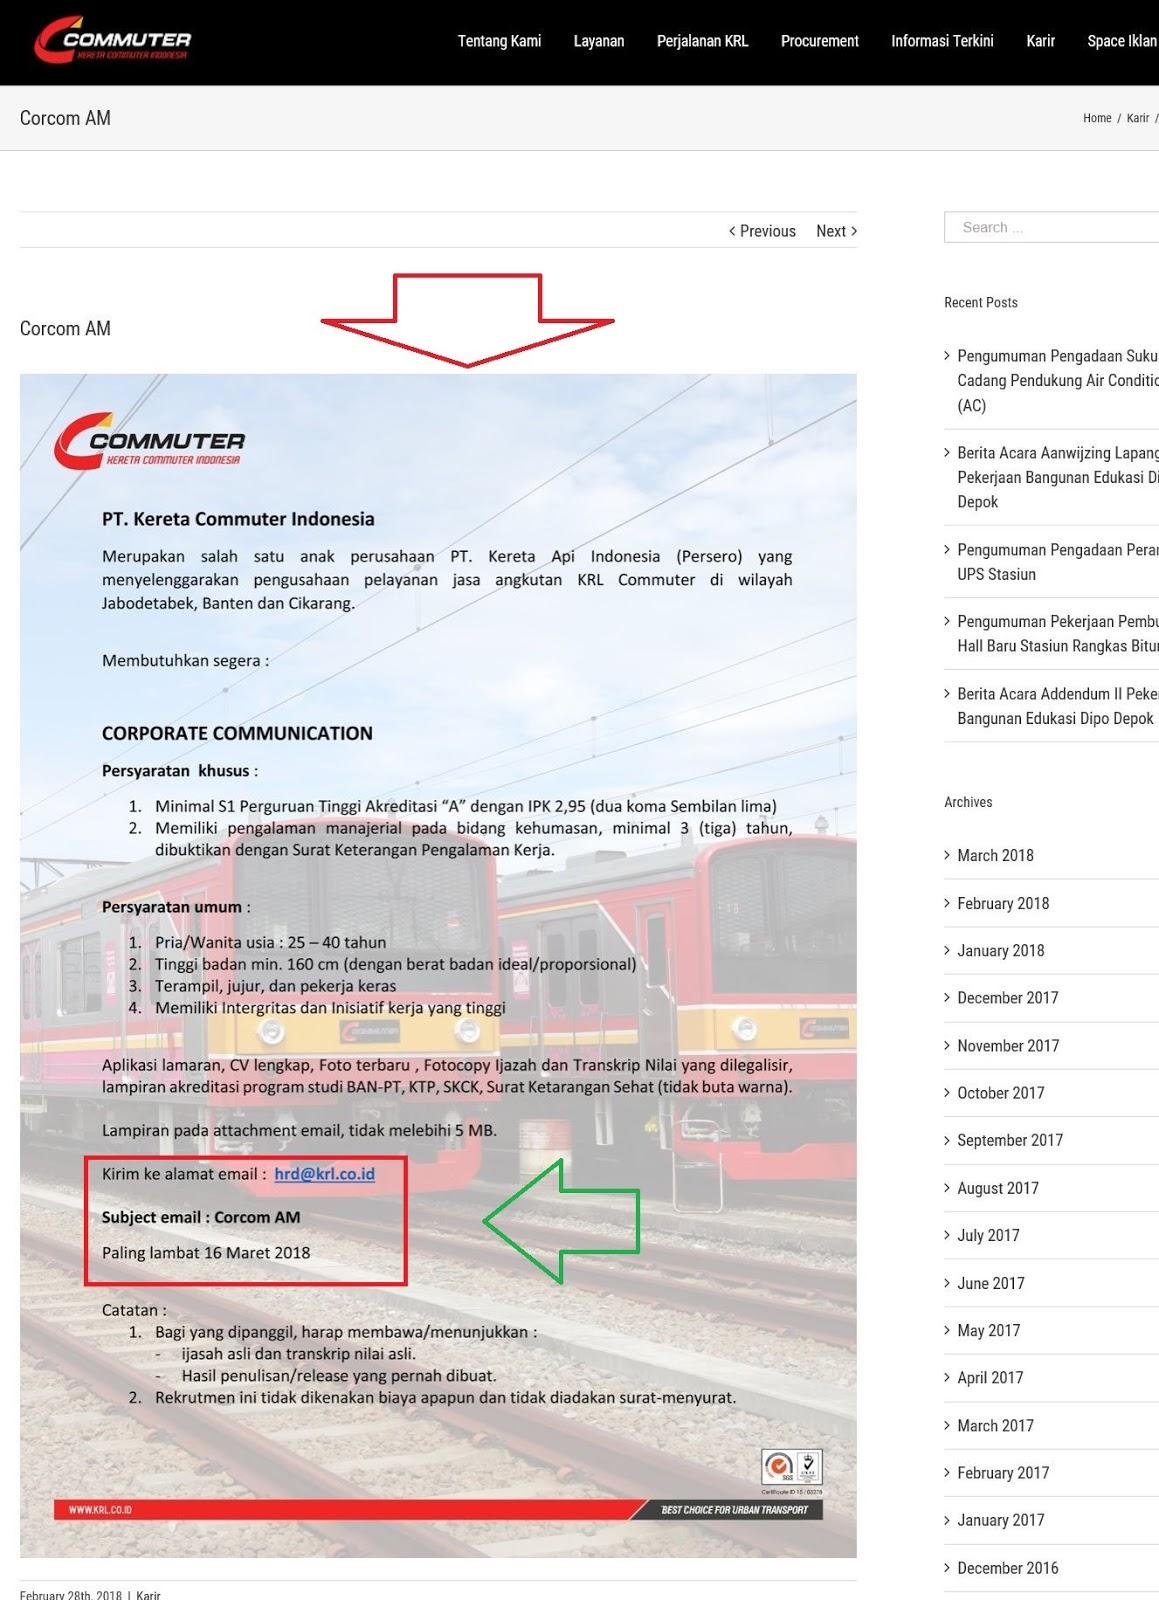 Cara Melamar Kerja Di PT Kereta Commuter Indonesia (BUMN)